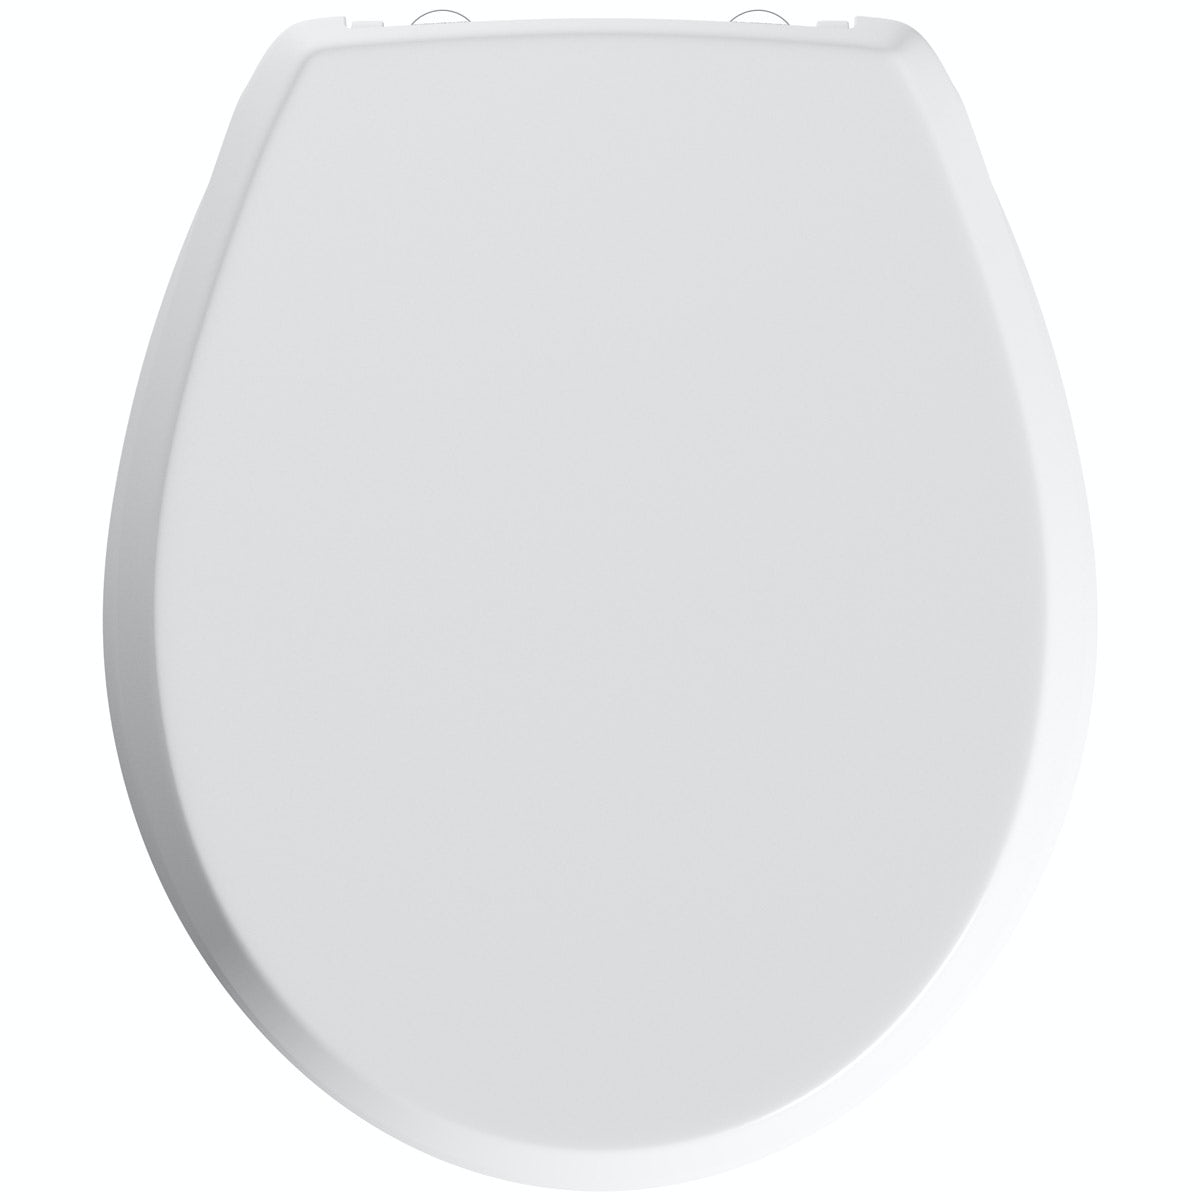 Clarity universal thermoset toilet seat